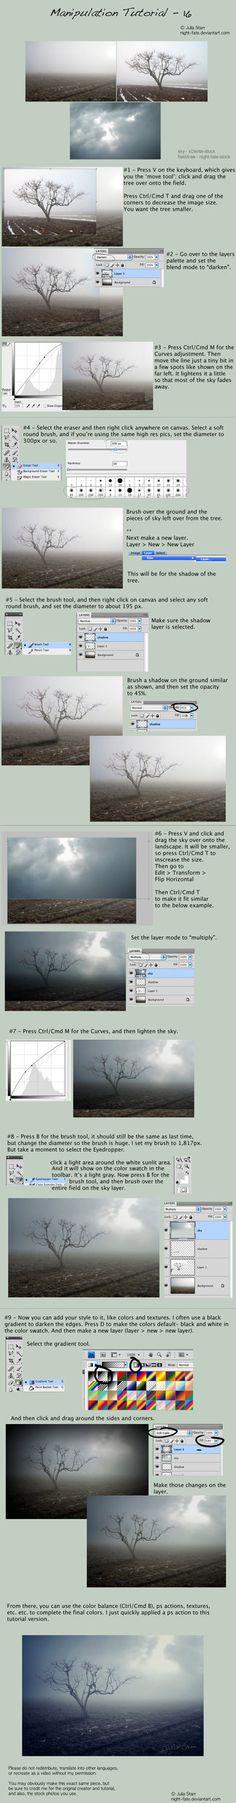 Nature Photoshop tutorial